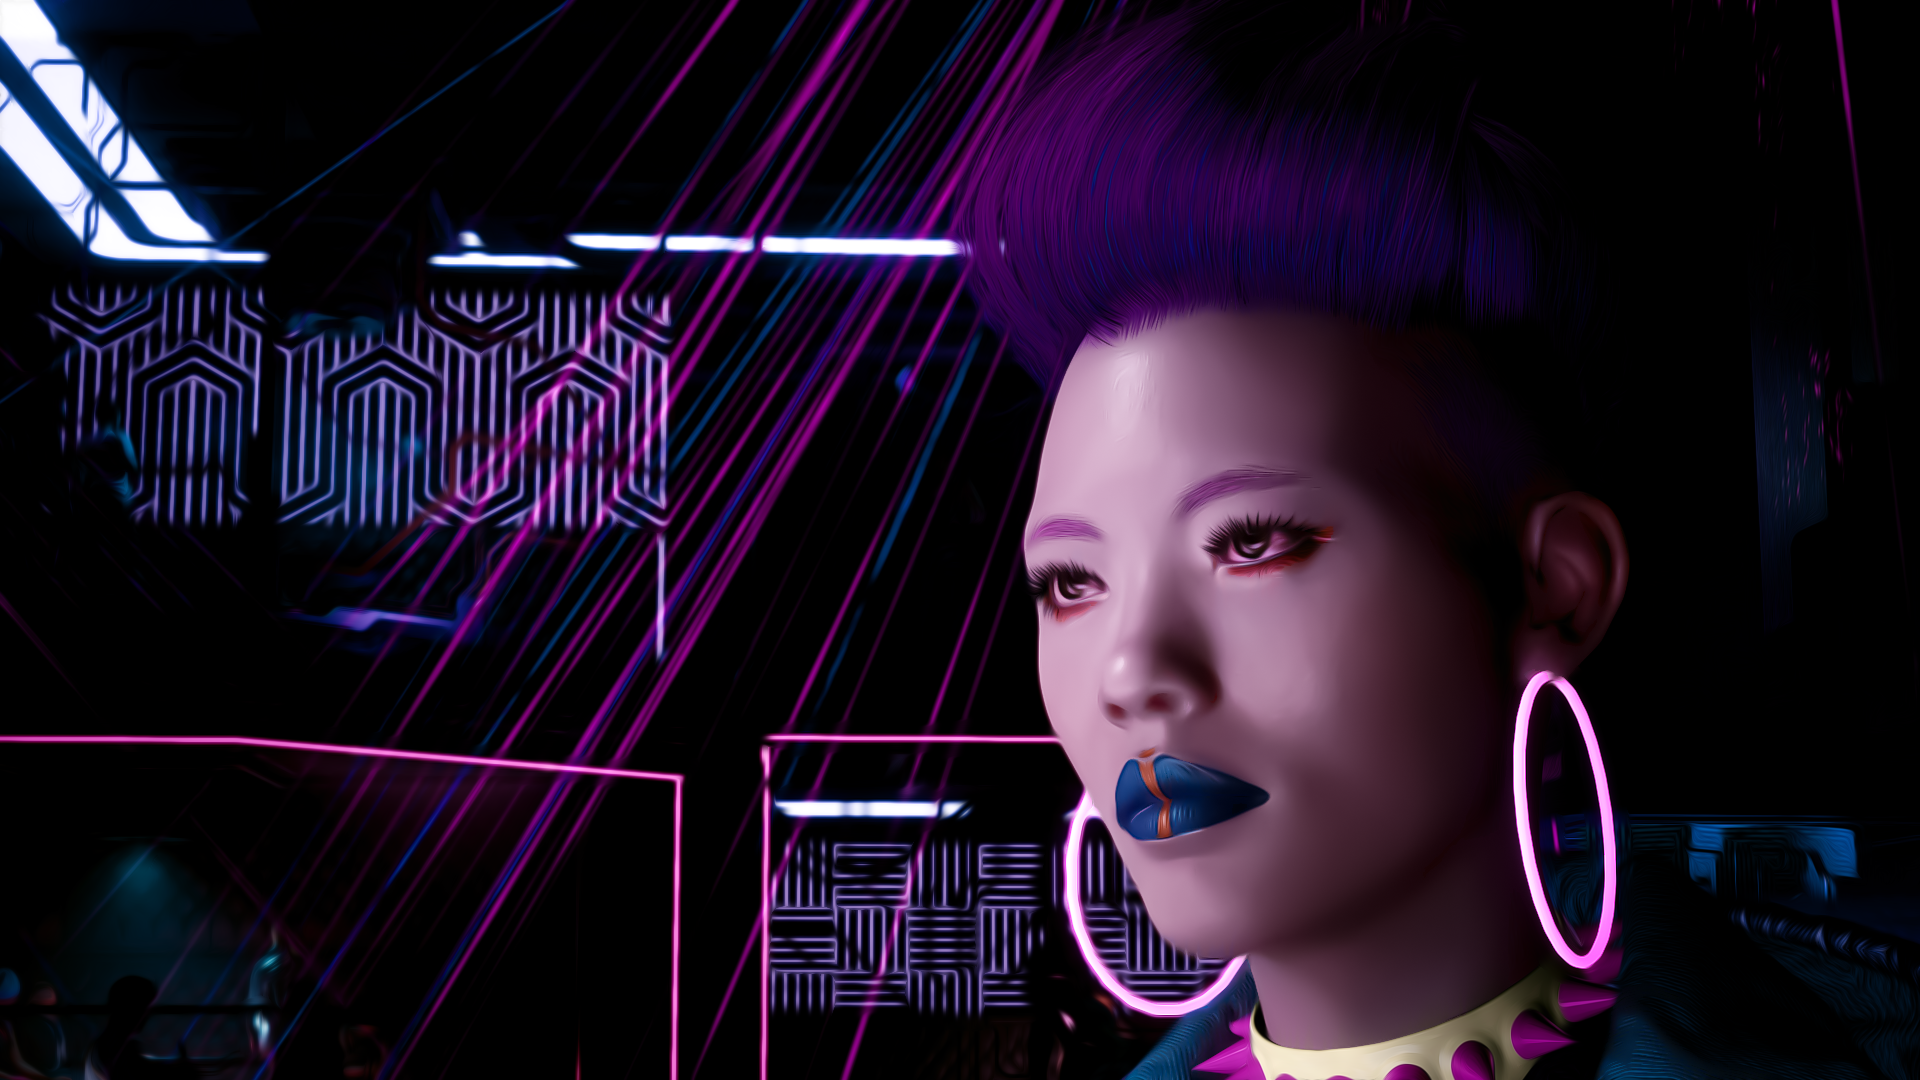 General 1920x1080 cyberpunk Cyberpunk 2077 video games PC gaming women hoop earrings video game girls makeup purple hair Maiko (Cyberpunk 2077)